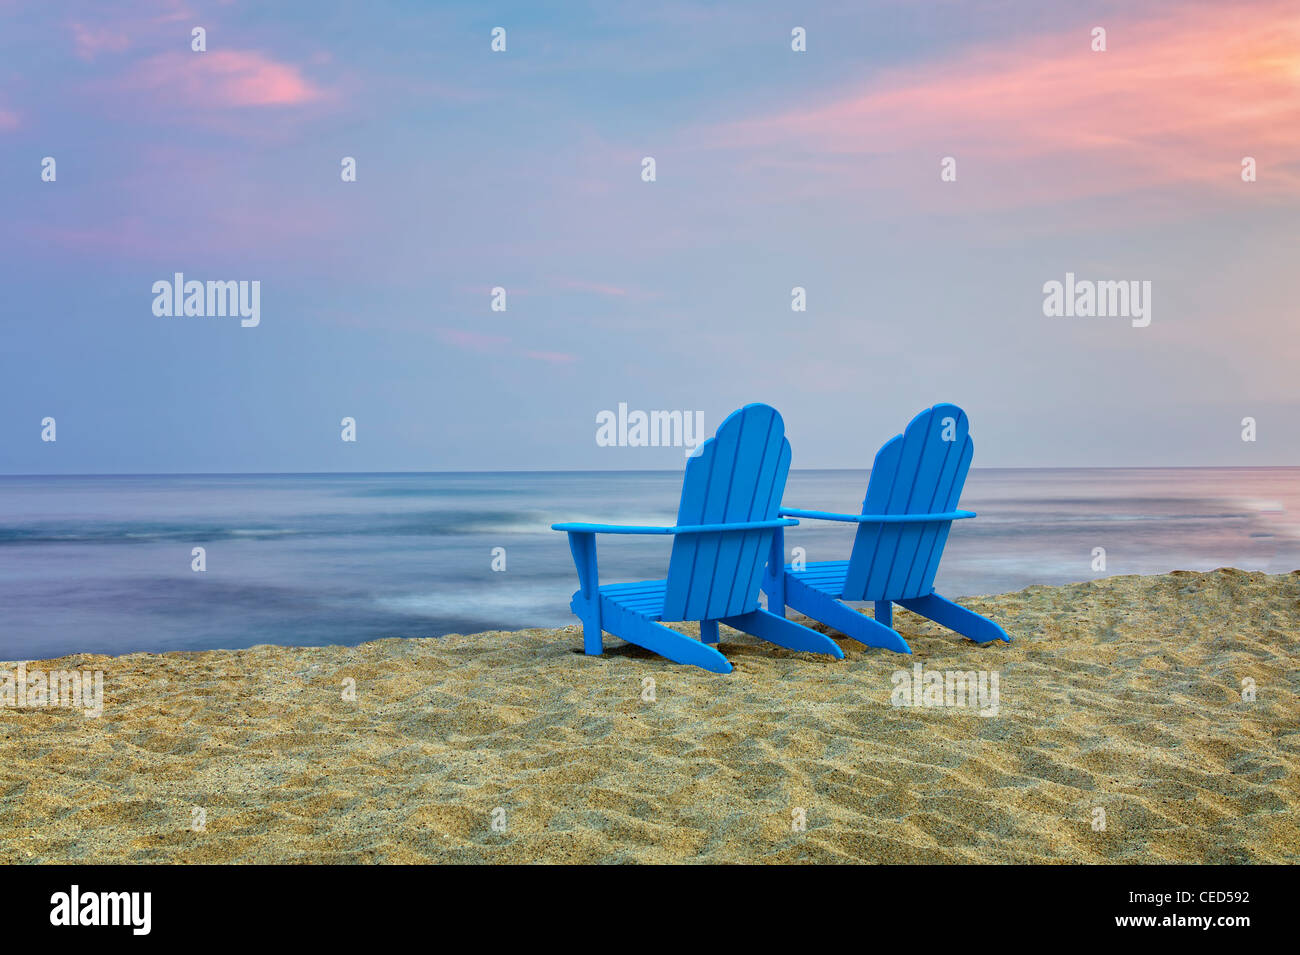 Adirondack chairs on beach Beach Painting Two Adirondack Chairs On Beach Hawaii The Big Island Alamy Two Adirondack Chairs On Beach Hawaii The Big Island Stock Photo